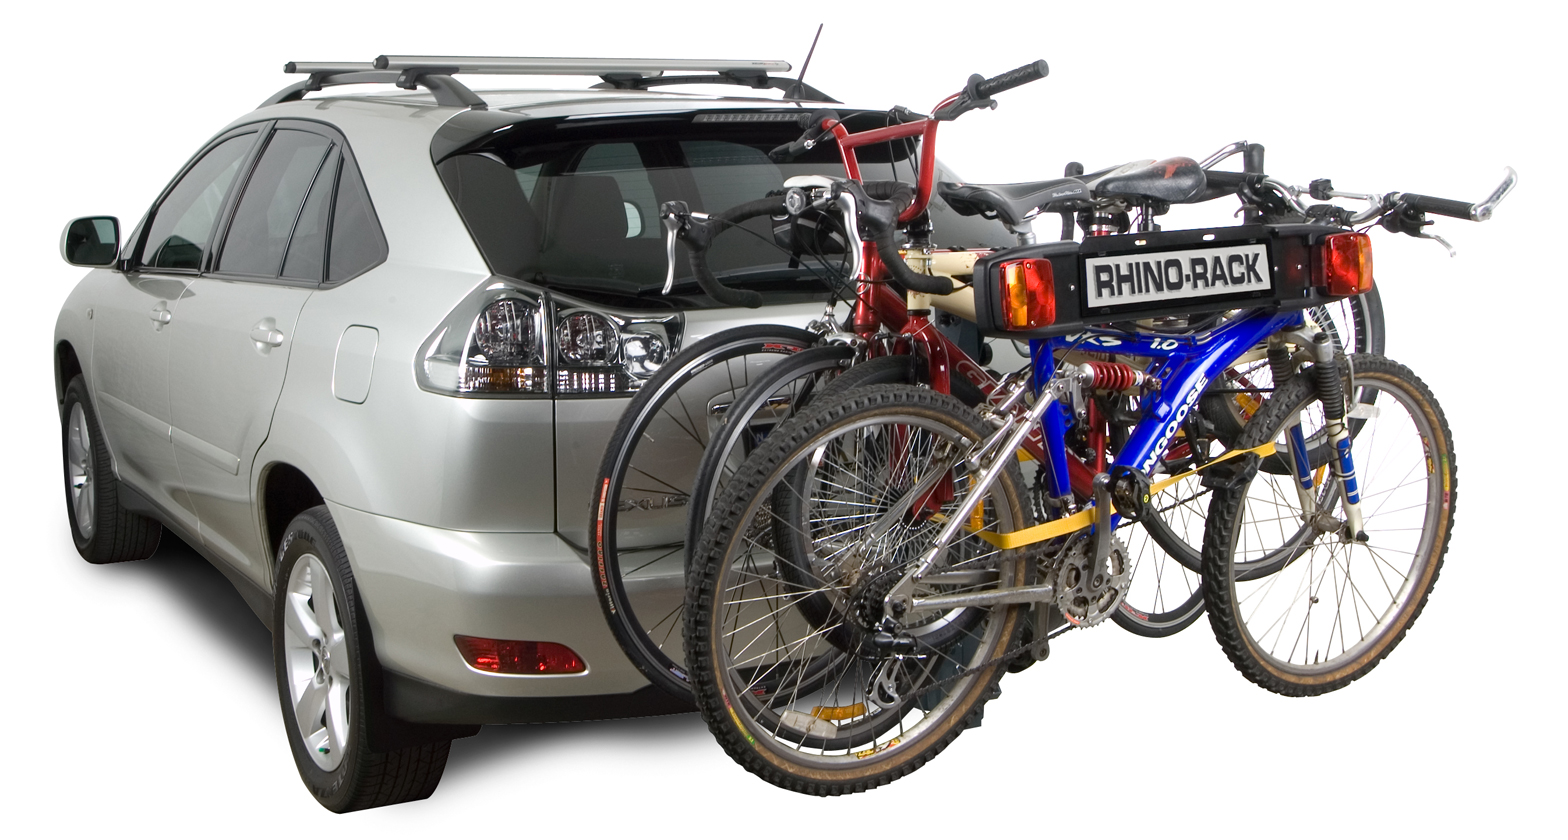 Rbc008 4 Bike Carrier Towball Mount Rhino Rack